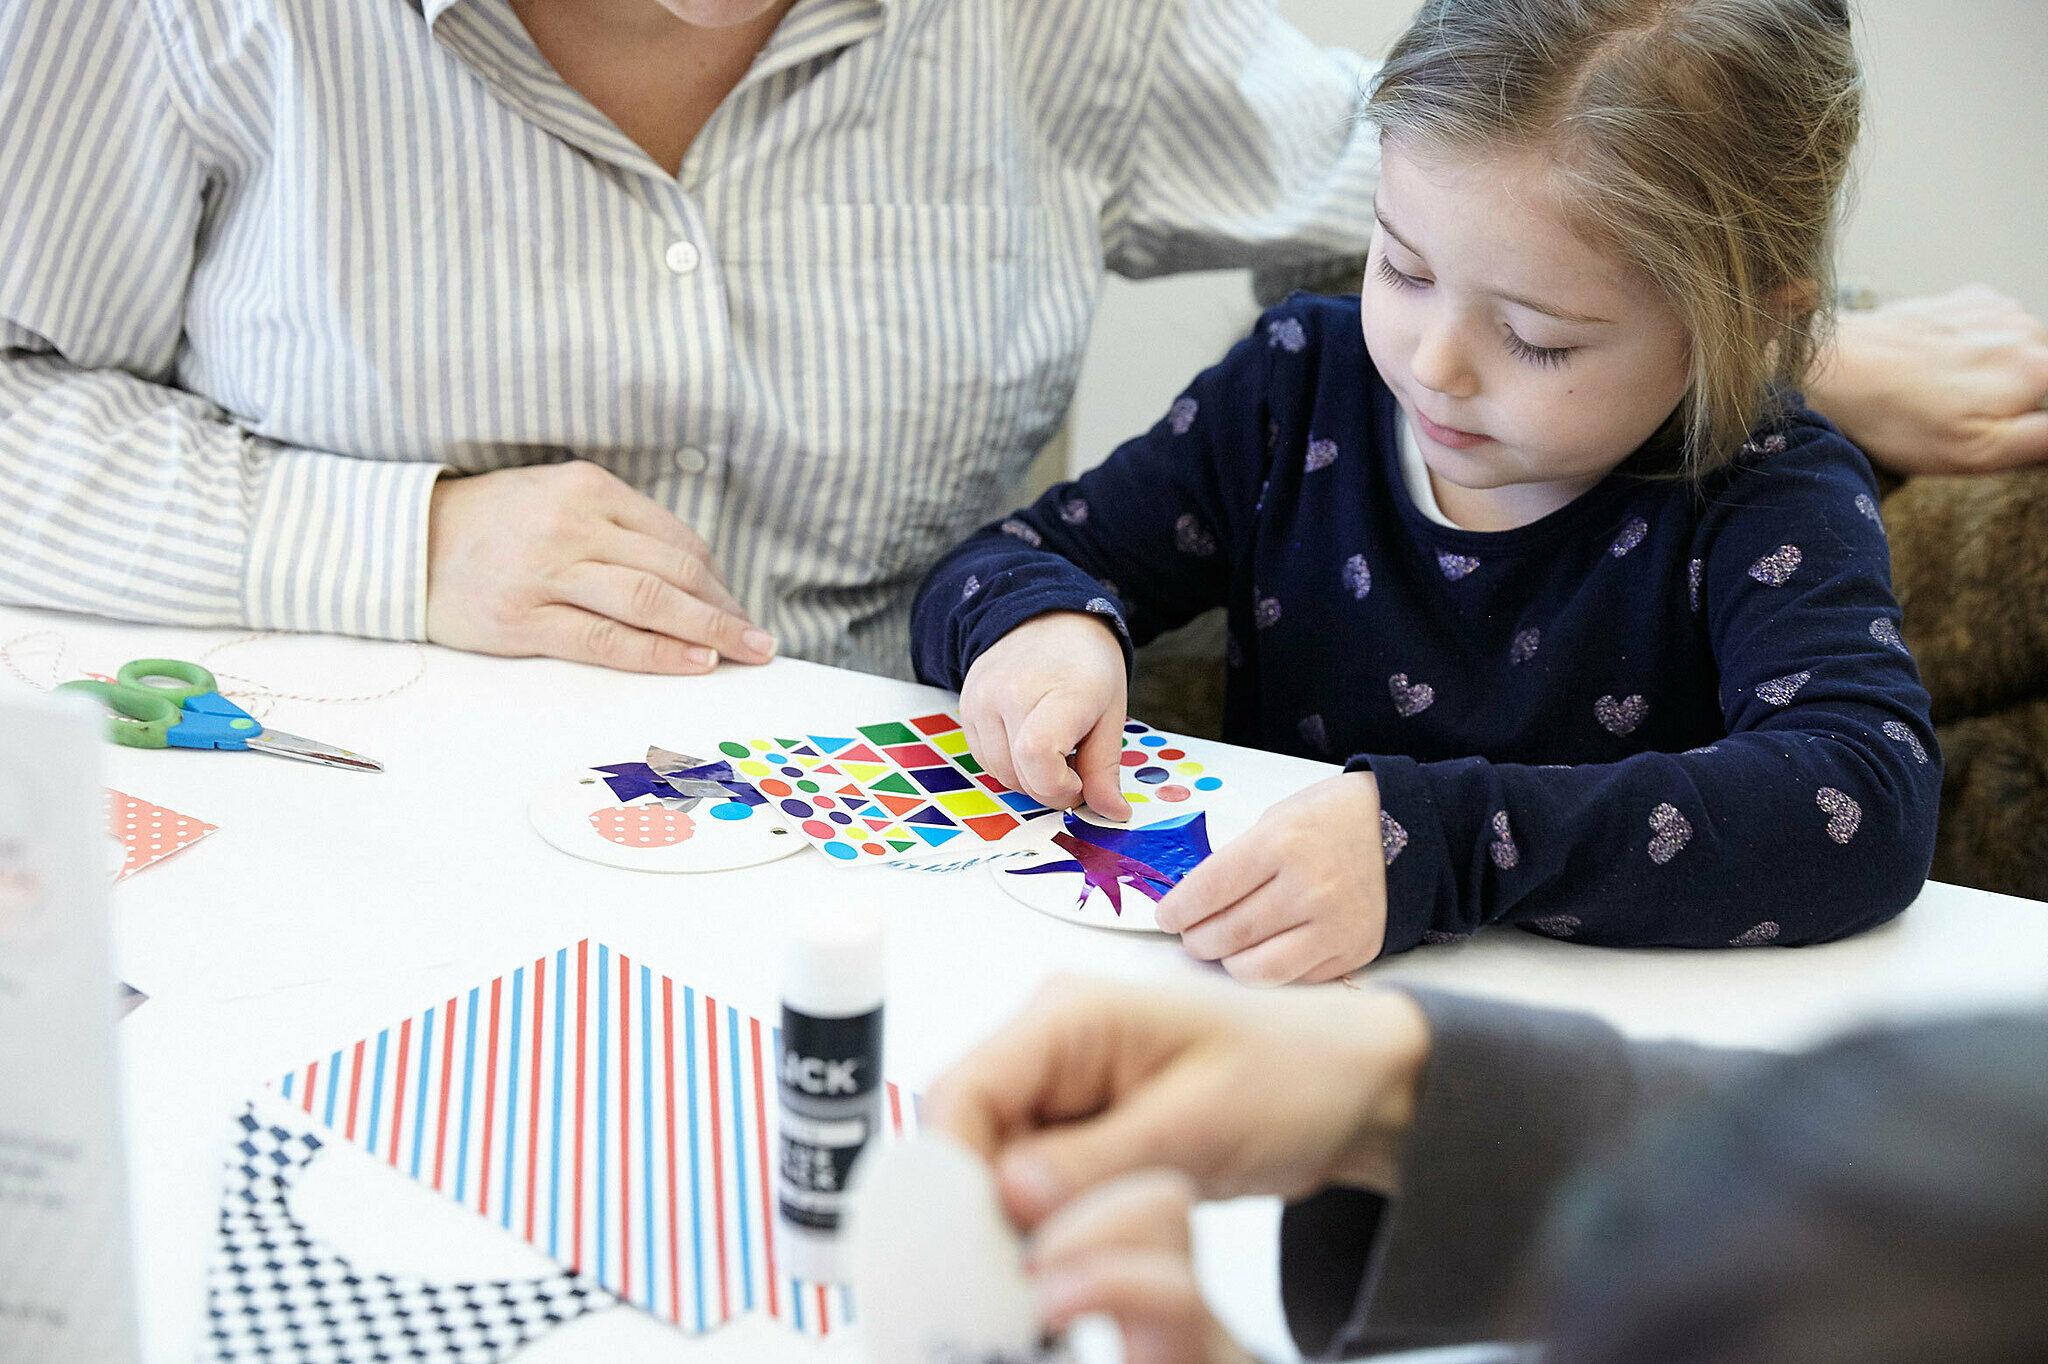 Kids work with art materials